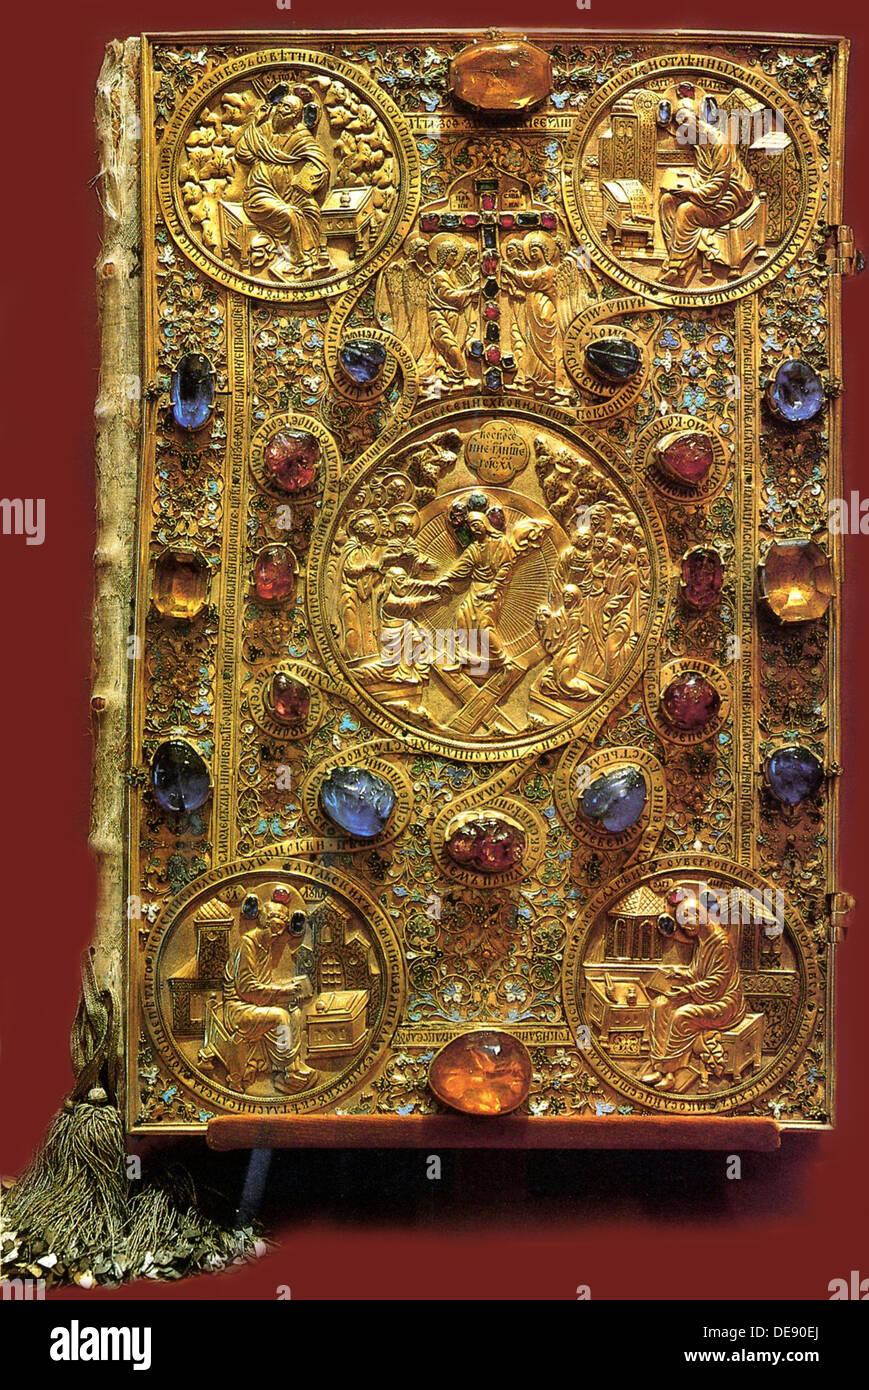 The Gospel Book of the Tsar Ivan IV the Terrible, 1571. Artist: Ancient Russian Art - Stock Image